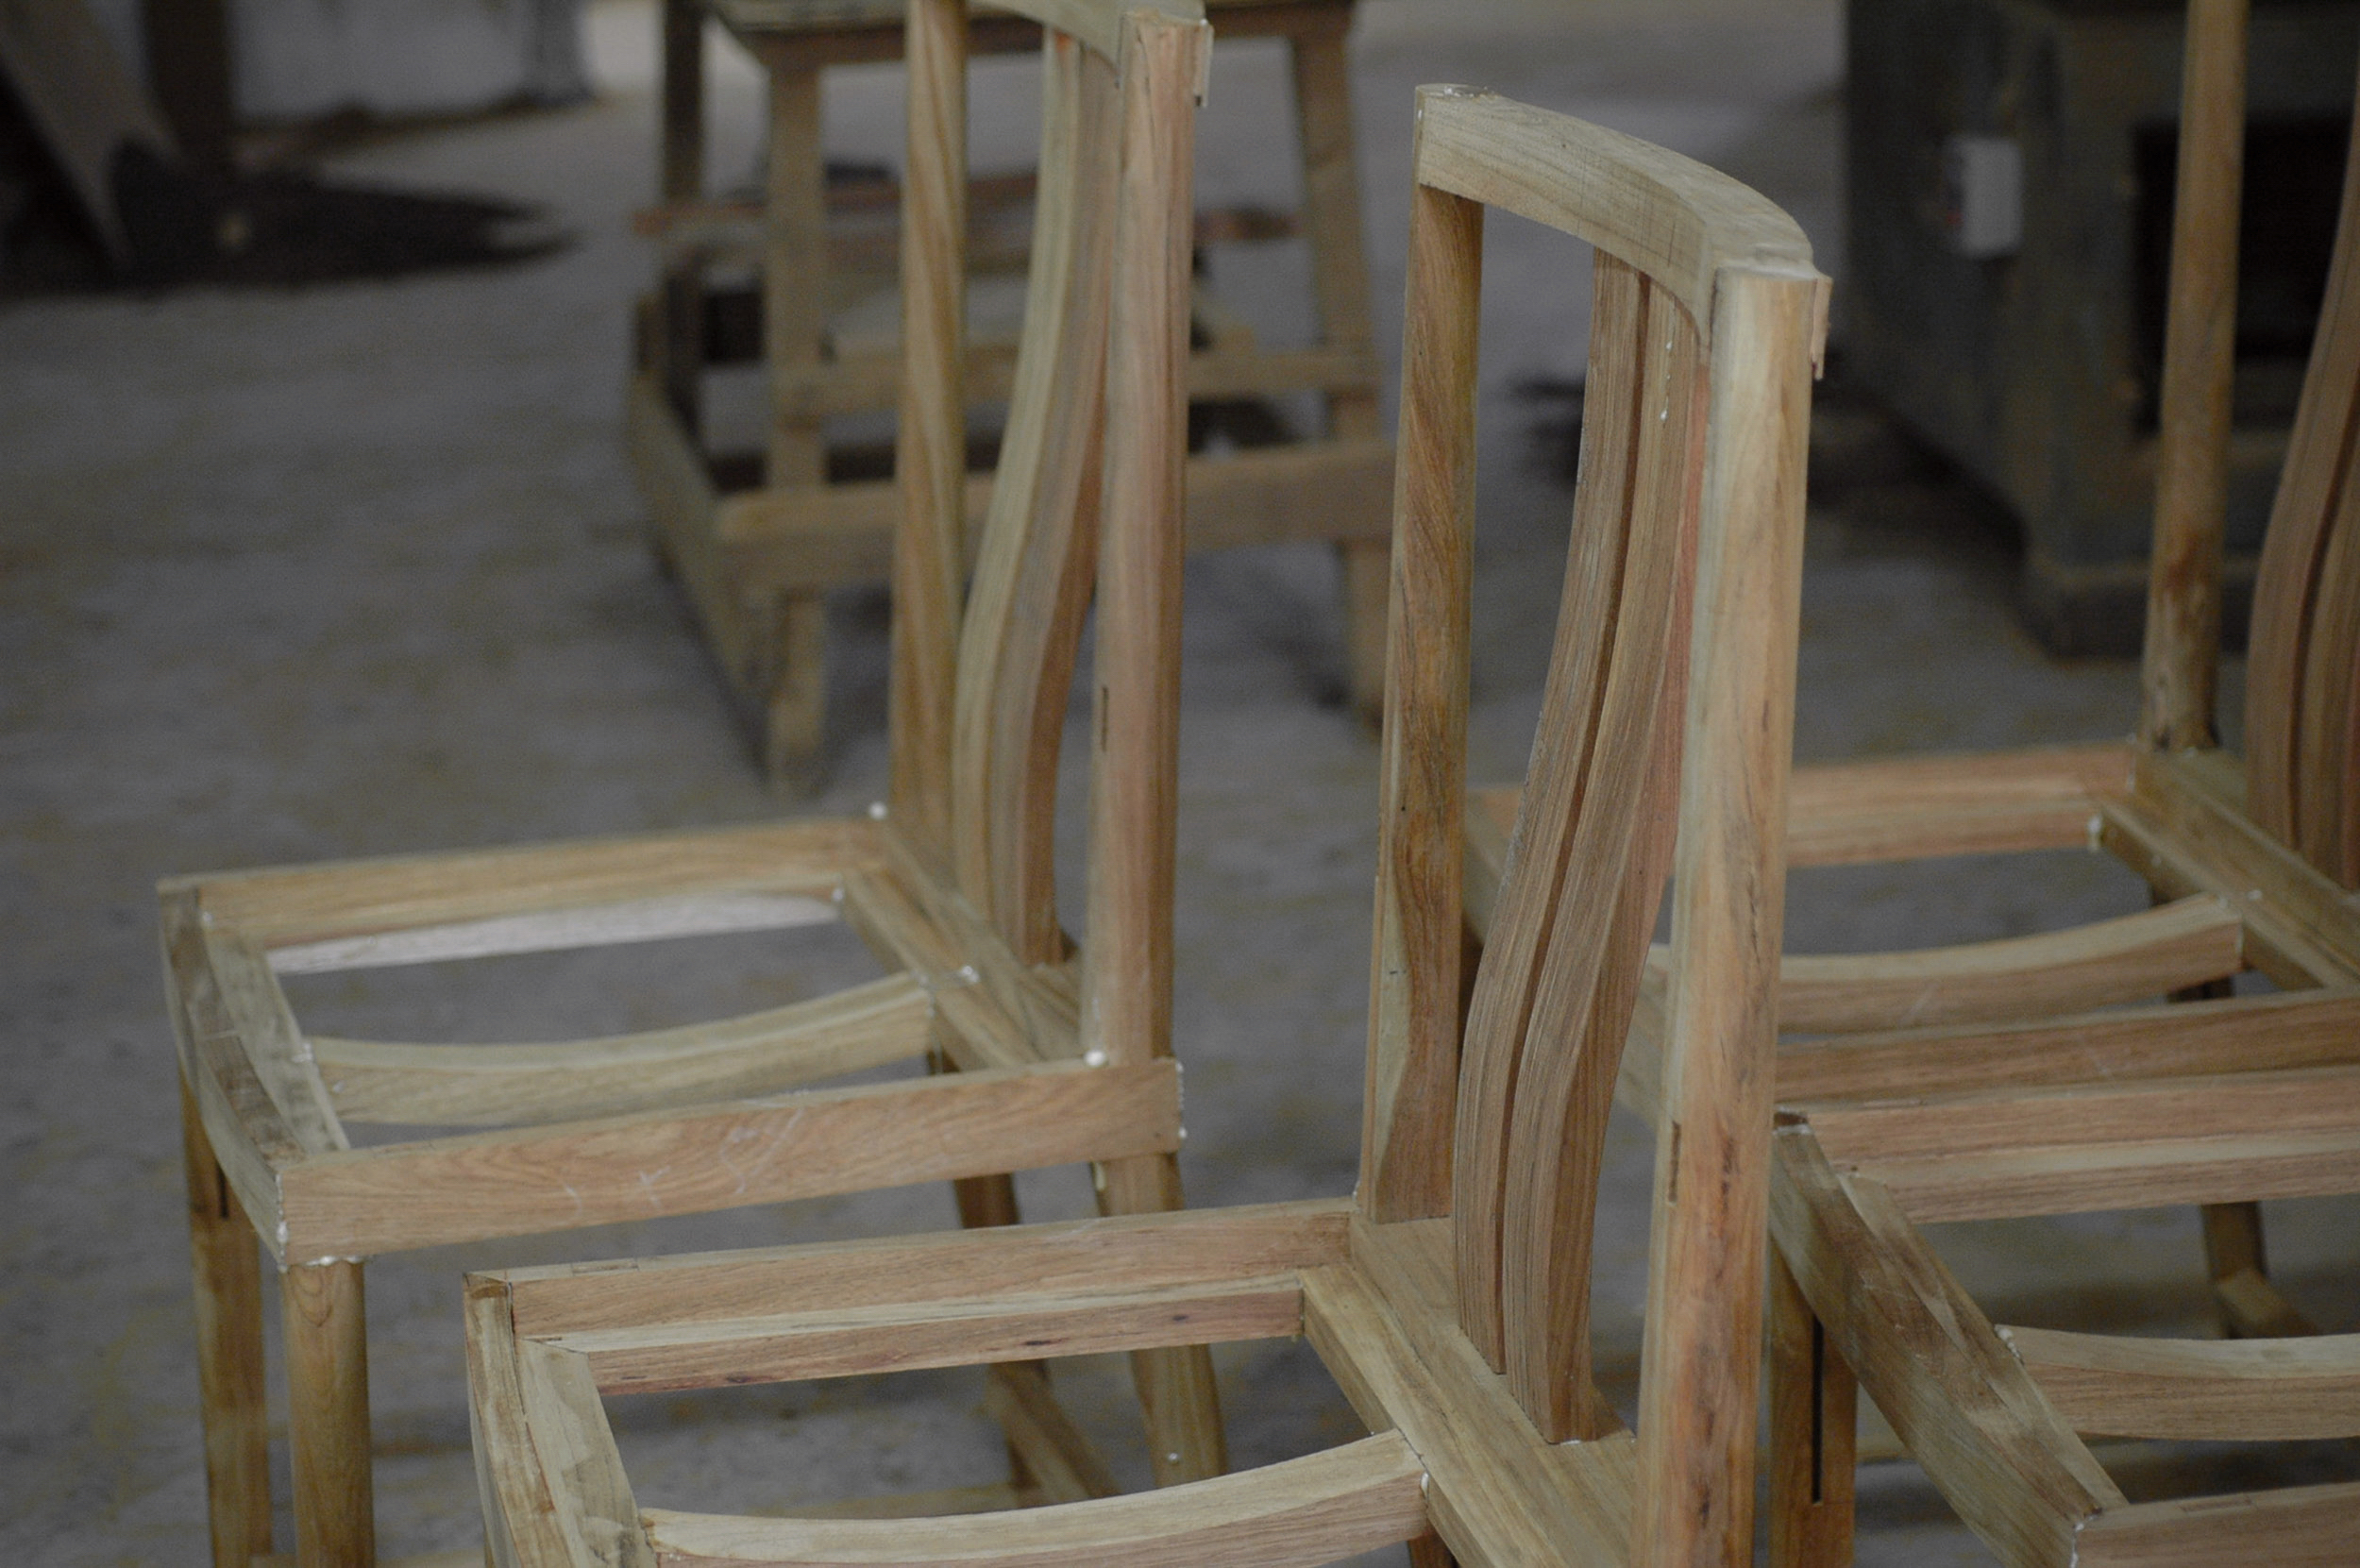 ....bespoke art deco furniture : artisan crafting photos ..特别定制艺术装饰风格家具 : 公丈制作照片....